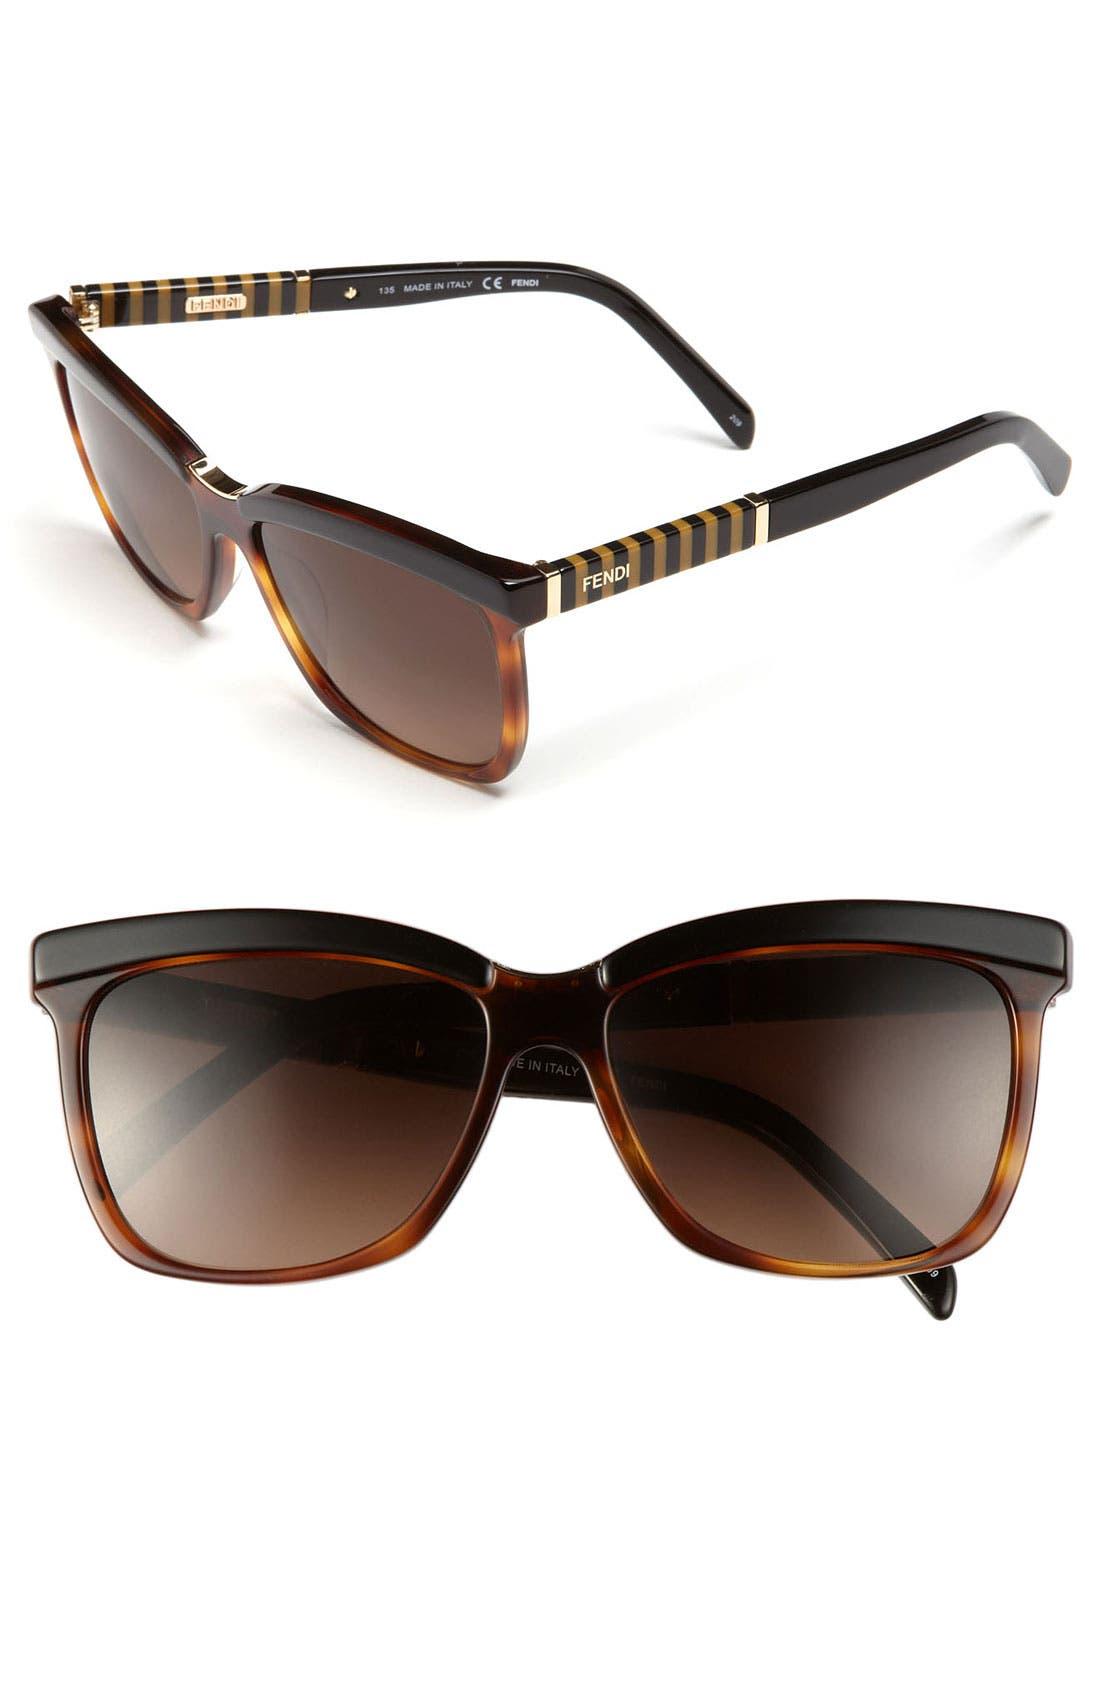 Main Image - Fendi 55mm Oversized Sunglasses